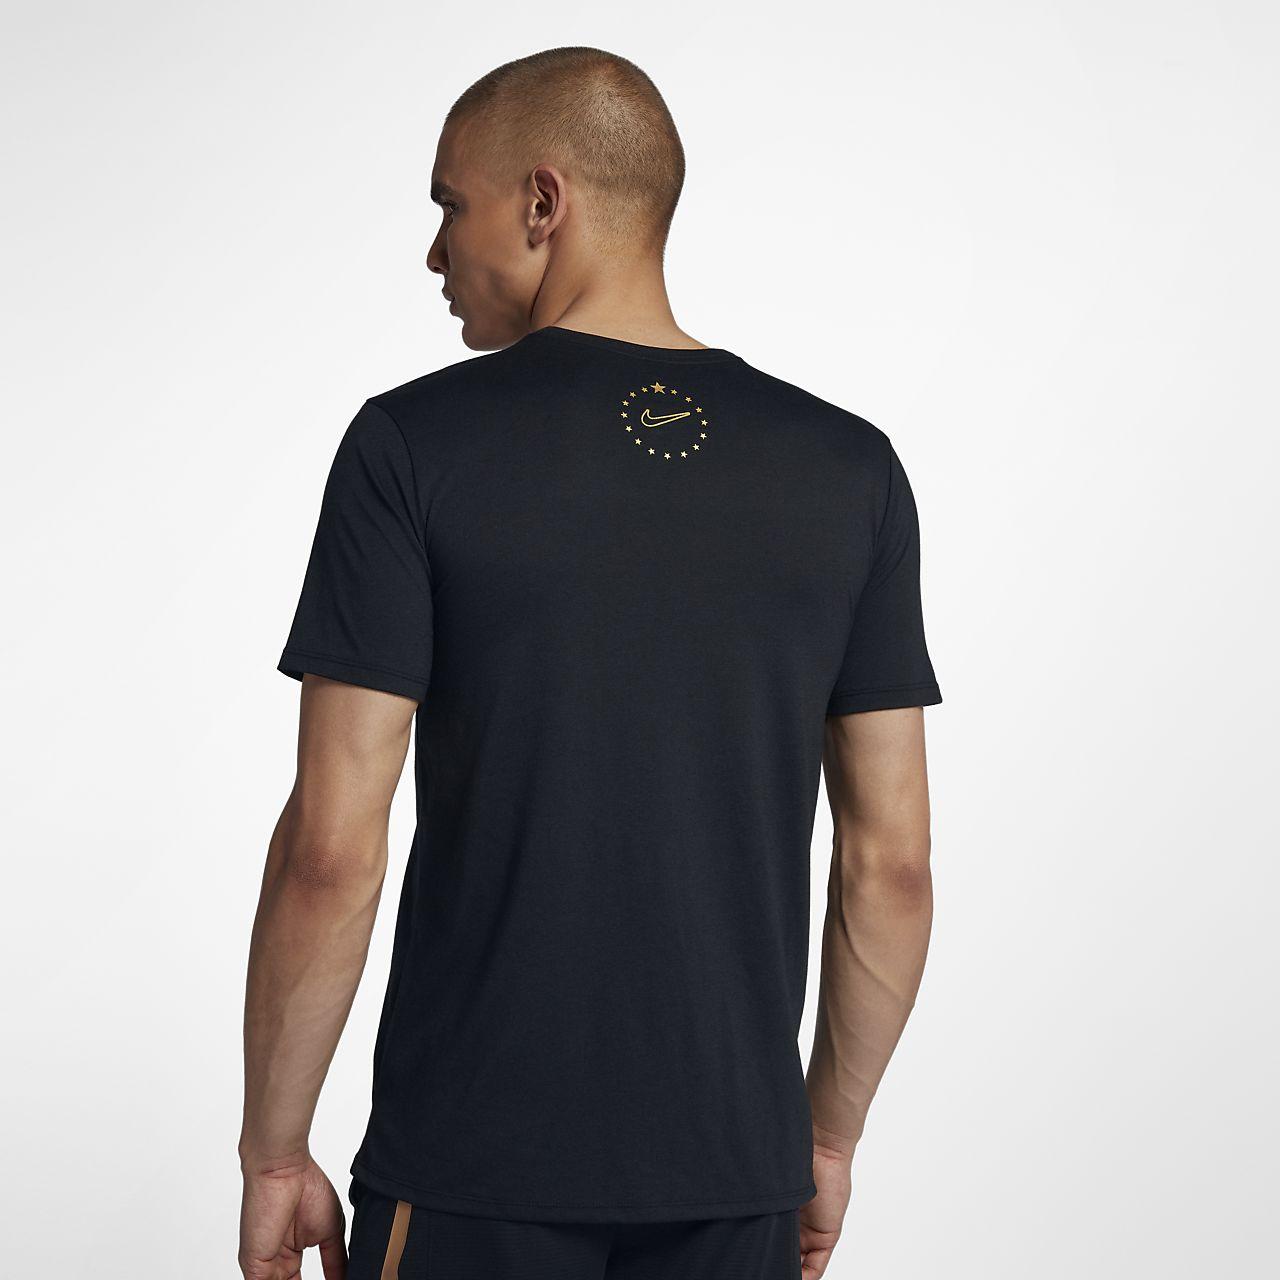 ... Nike Dri-FIT Banner Men's Basketball T-Shirt